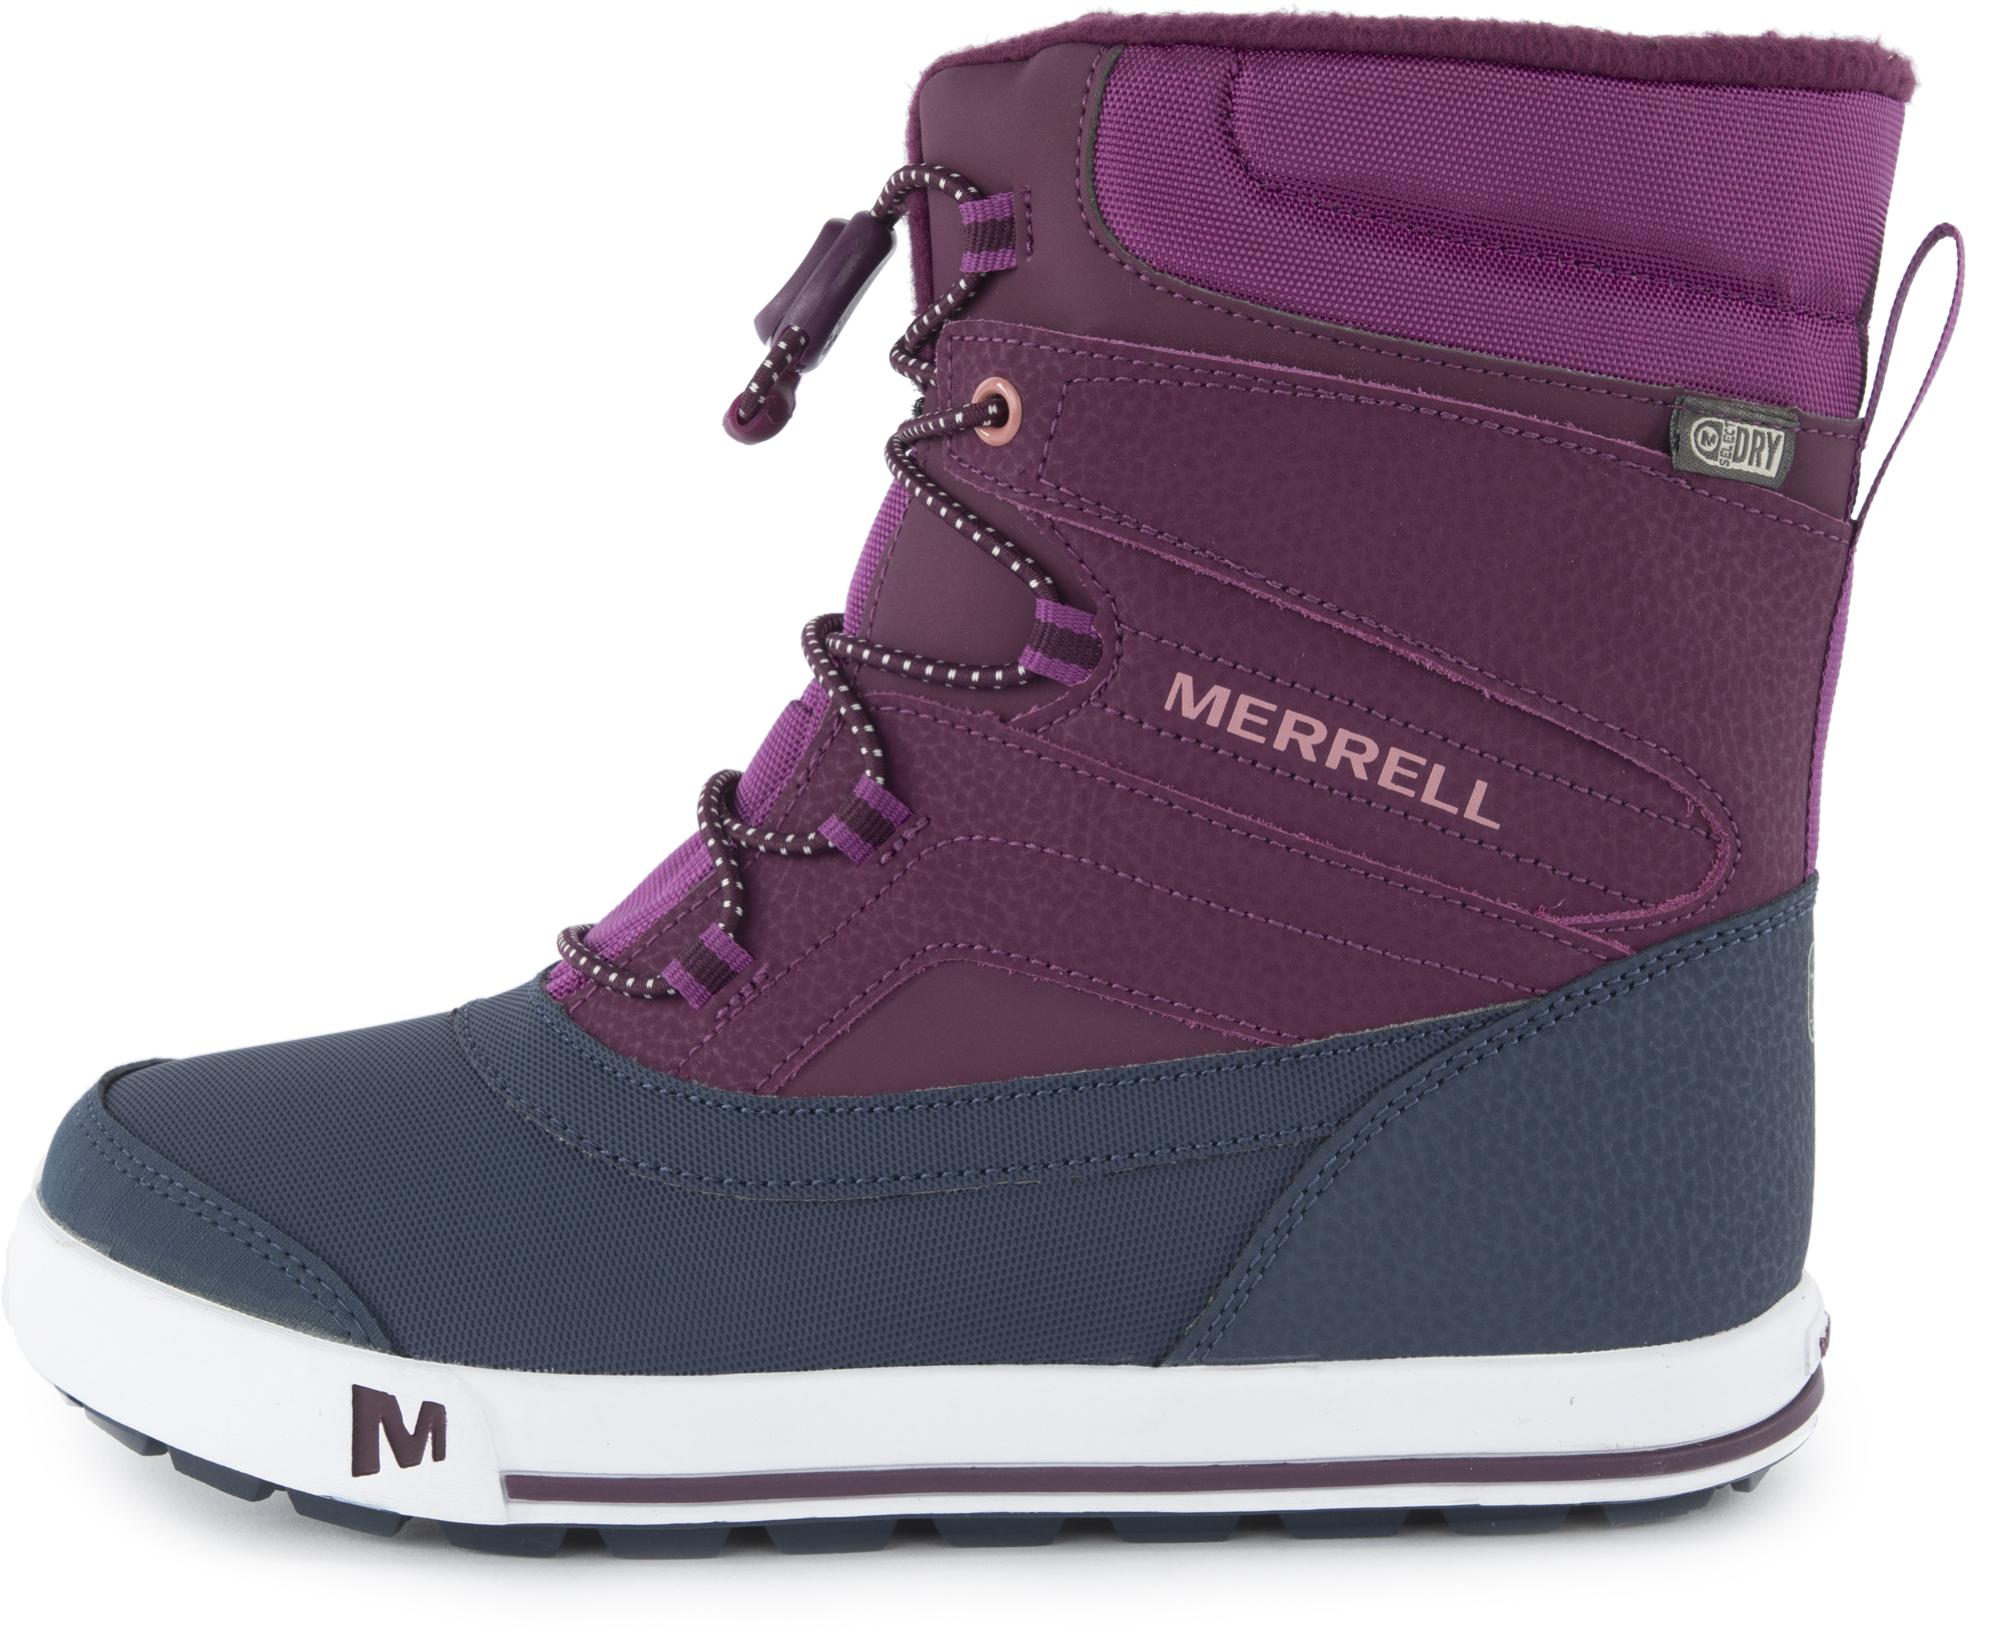 Merrell Ботинки утепленные для девочек Merrell Ml-Snow Bank 2.0, размер 37,5 цены онлайн